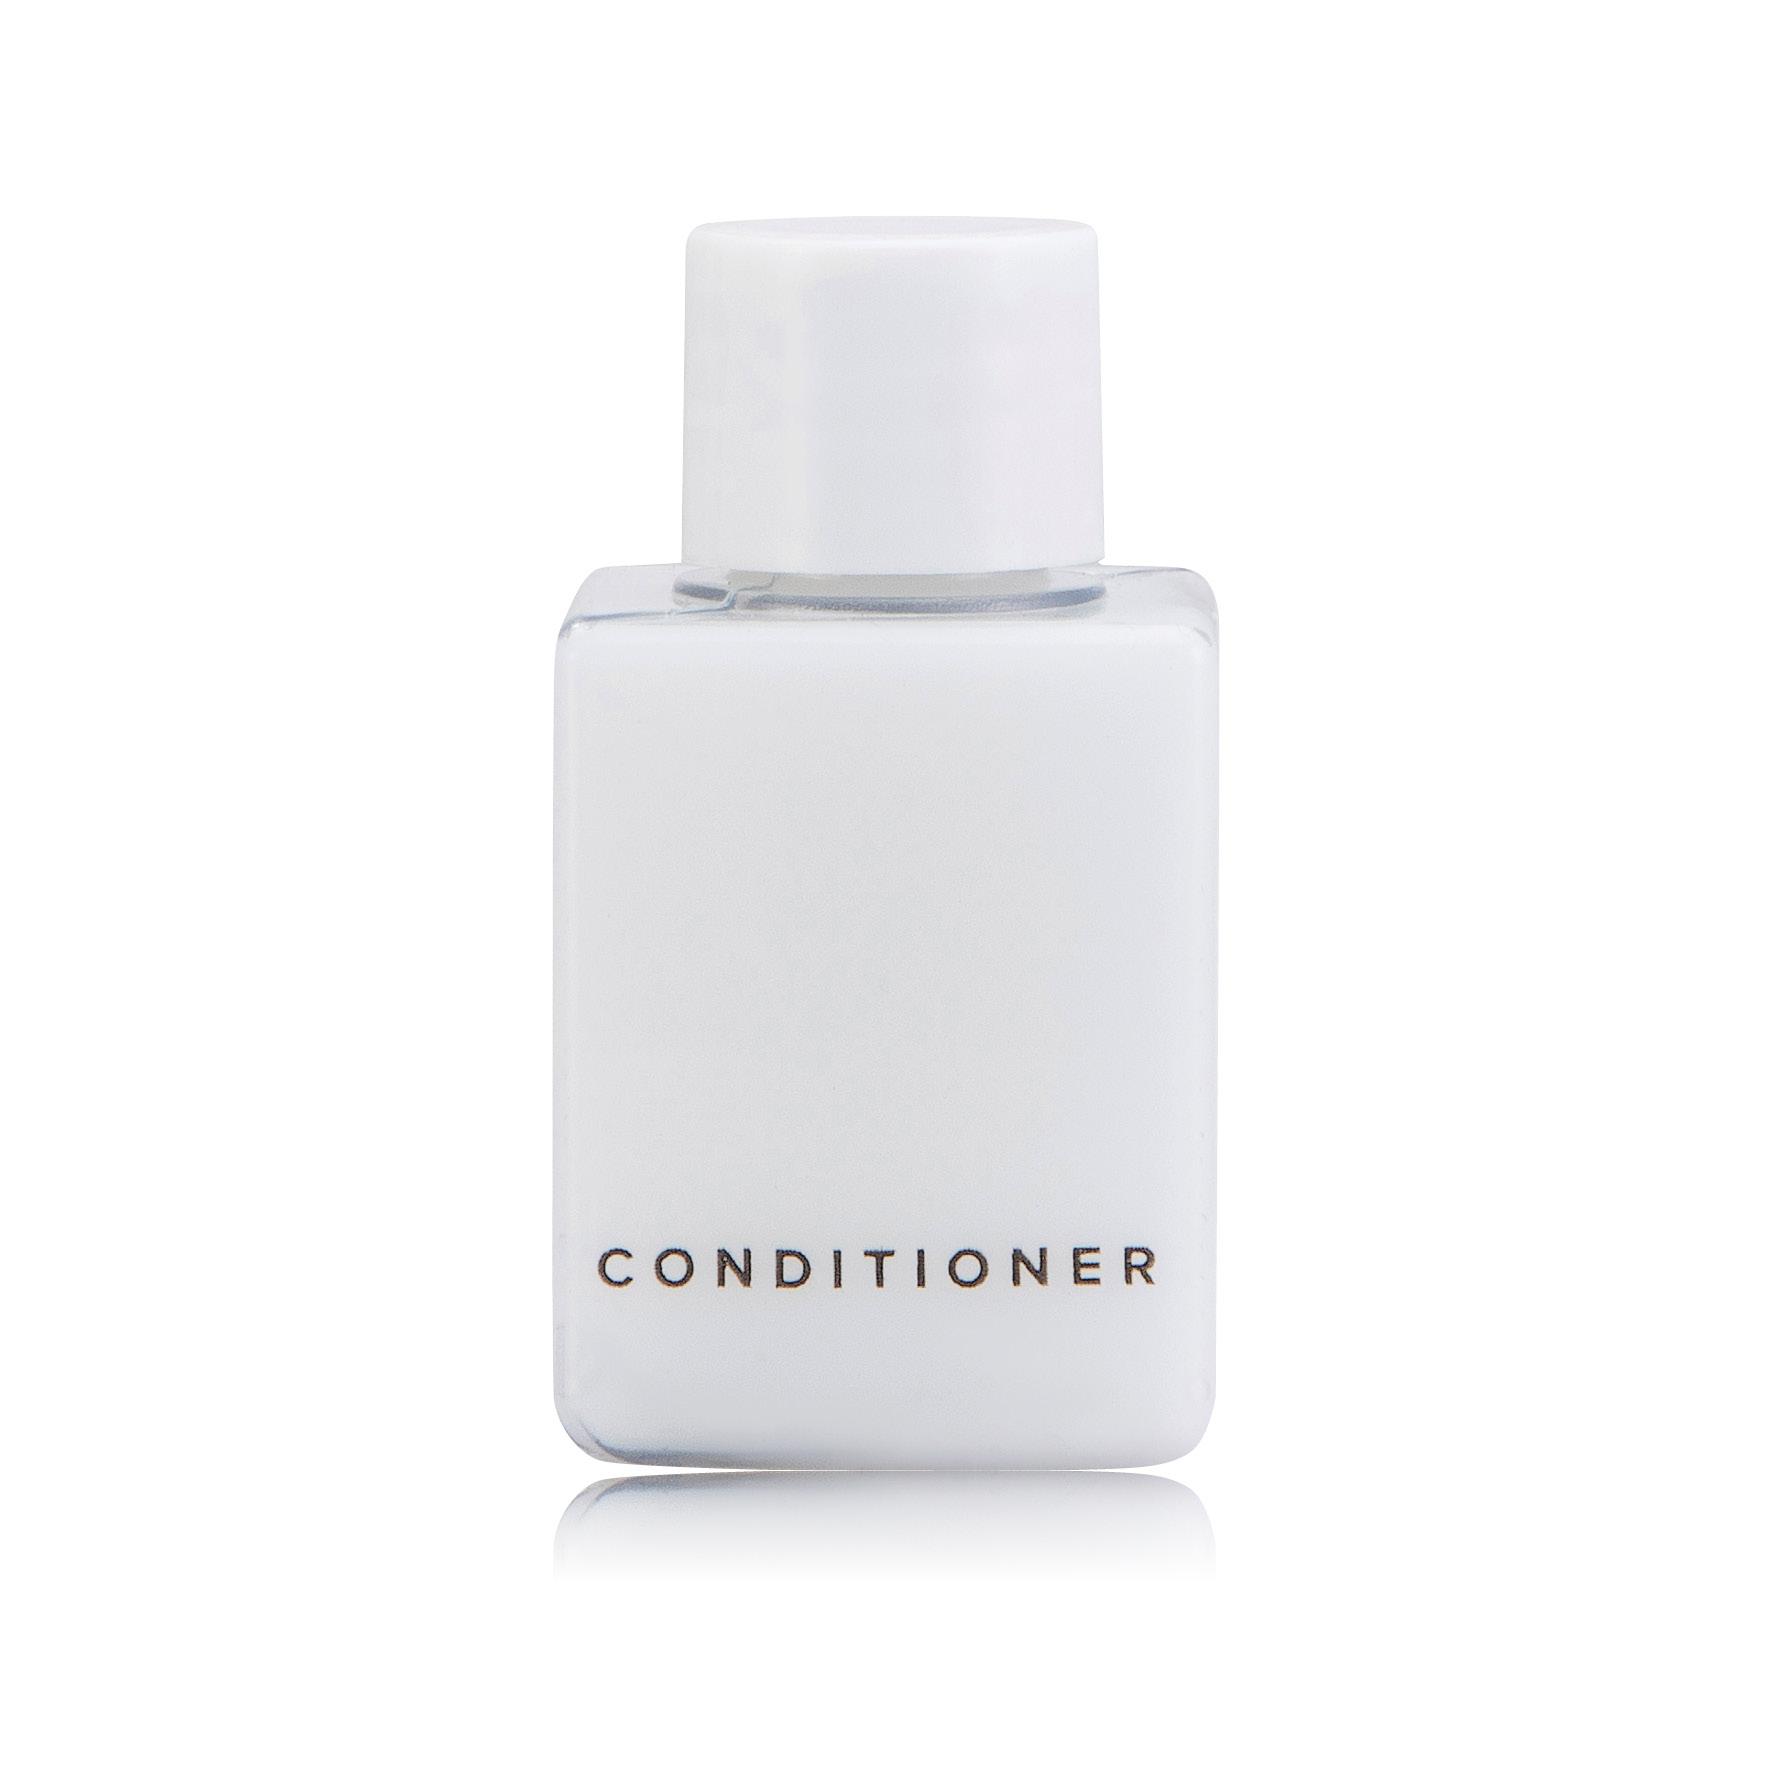 CONTEMP 35ML CONDITIONER FRONT